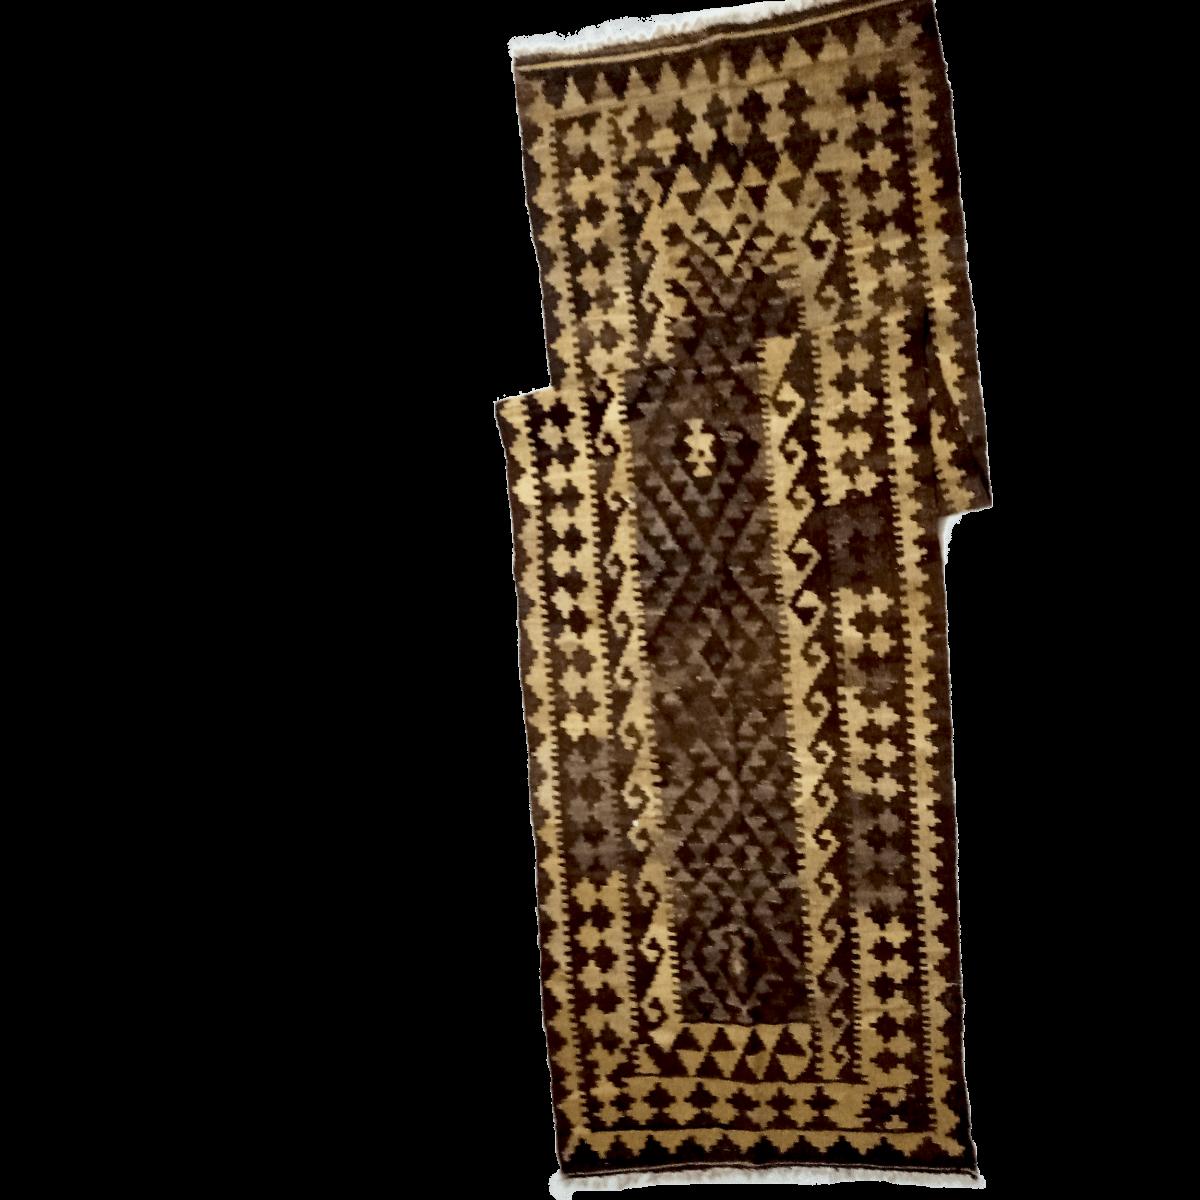 långa mattor